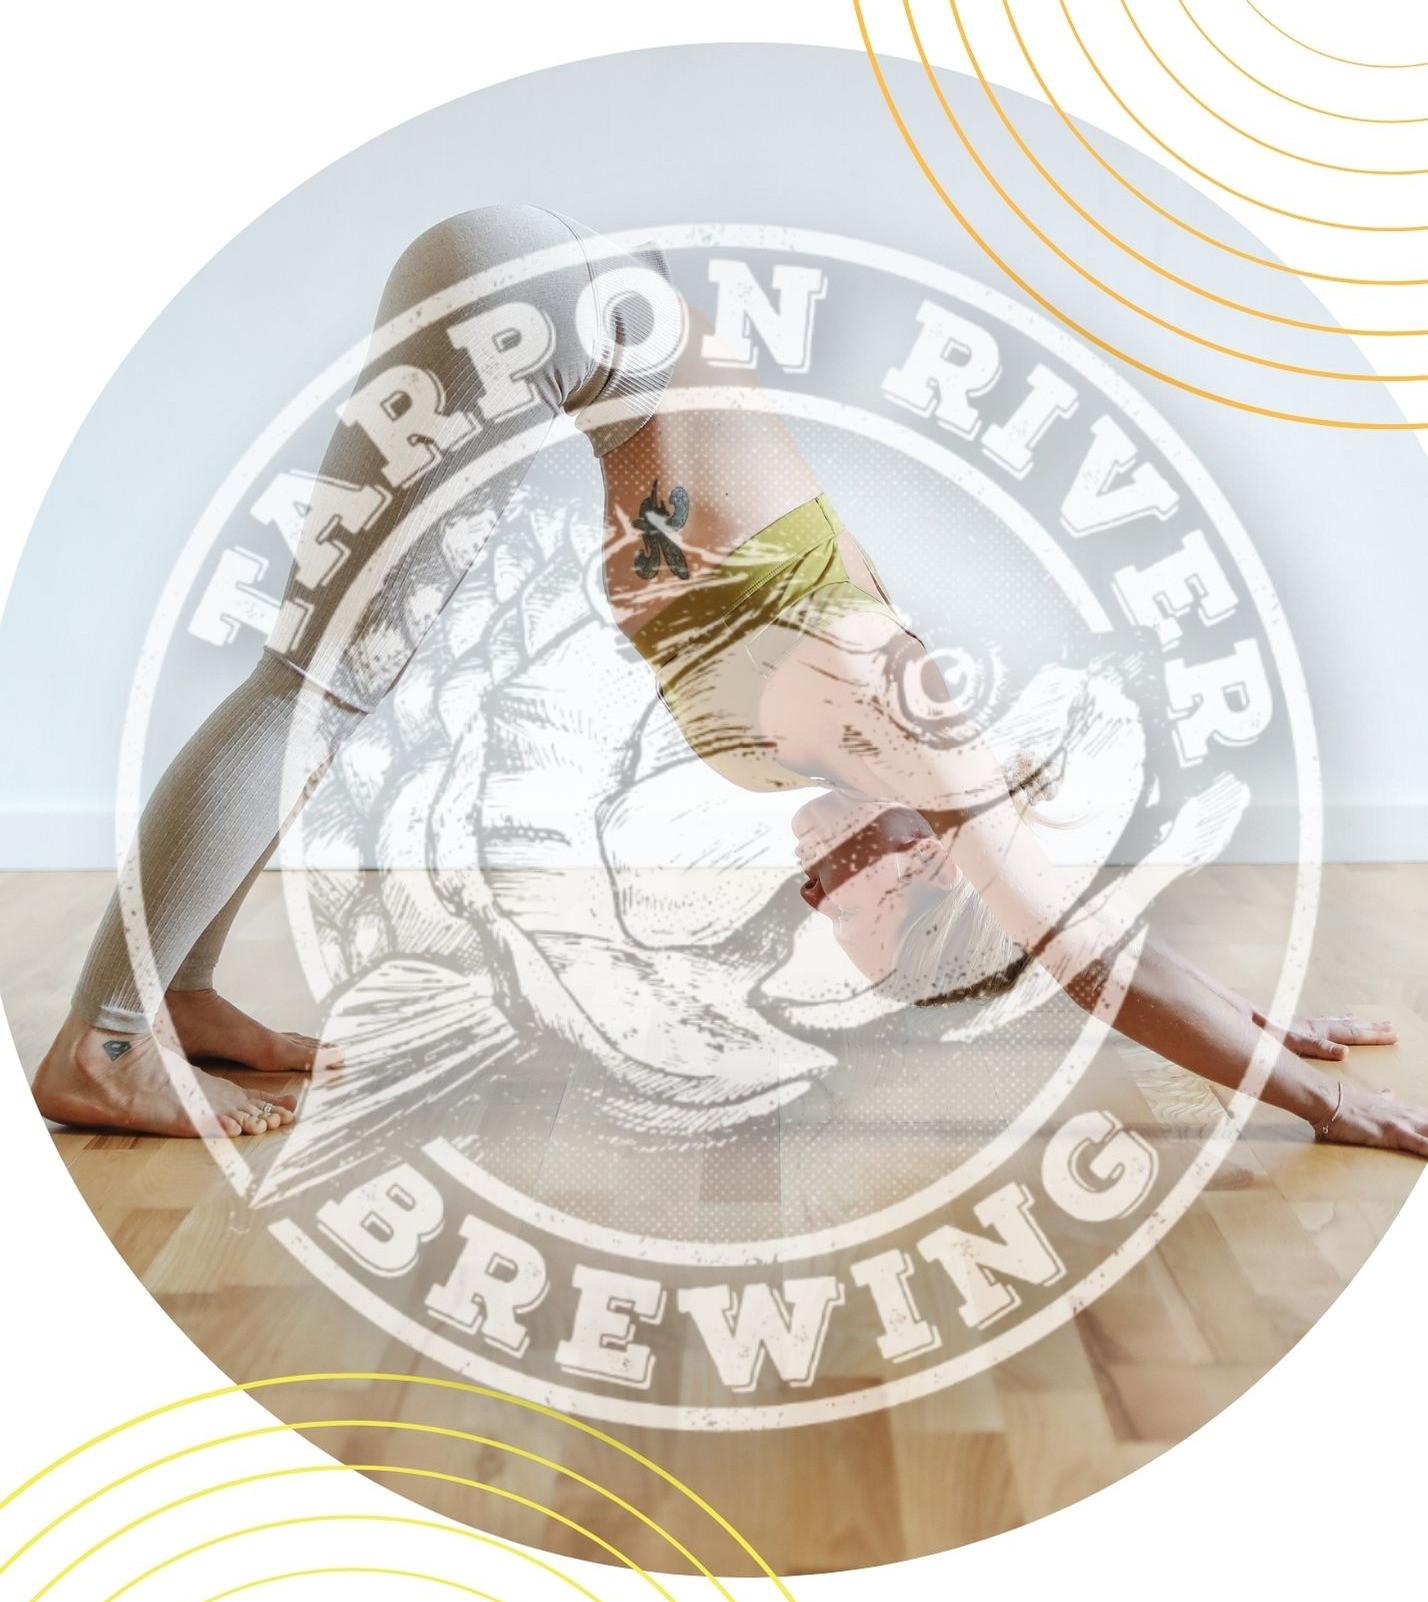 Monday Yoga at Tarpon River Brewing